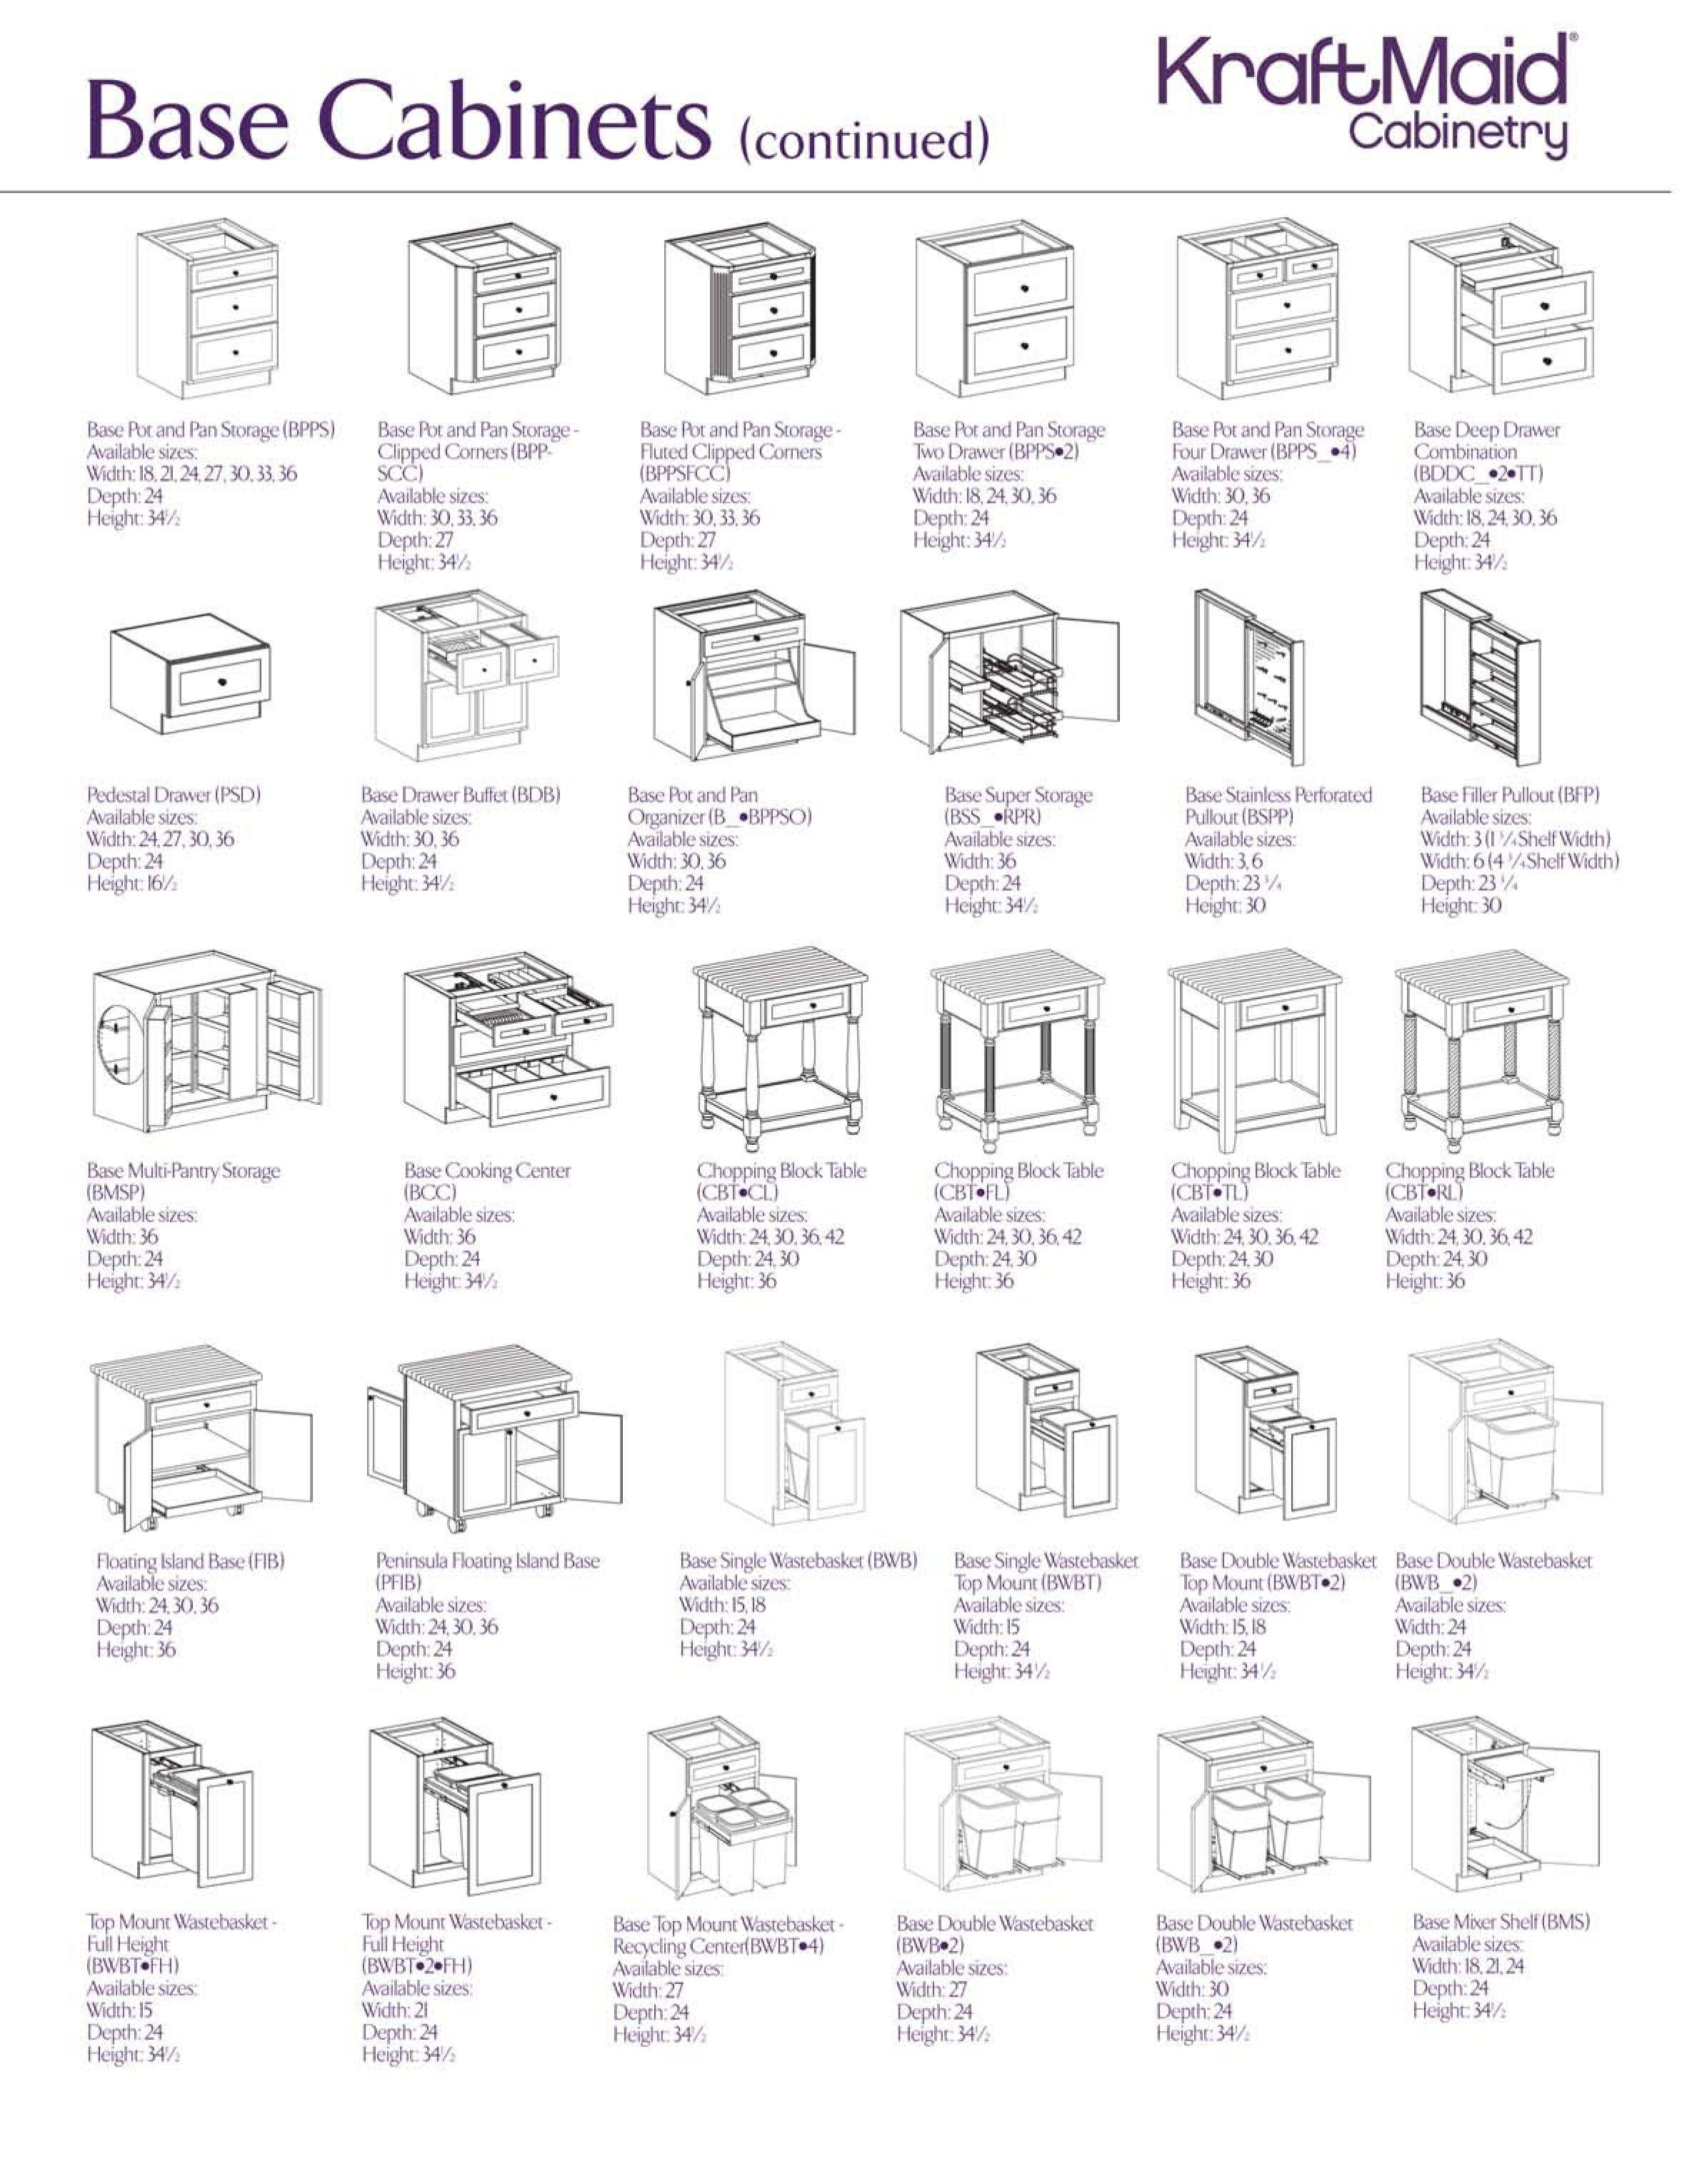 Kitchen Cabinets Sizes Layout 2021 In 2020 Kraftmaid Kitchen Cabinets Kitchen Cabinet Sizes Kraftmaid Kitchens